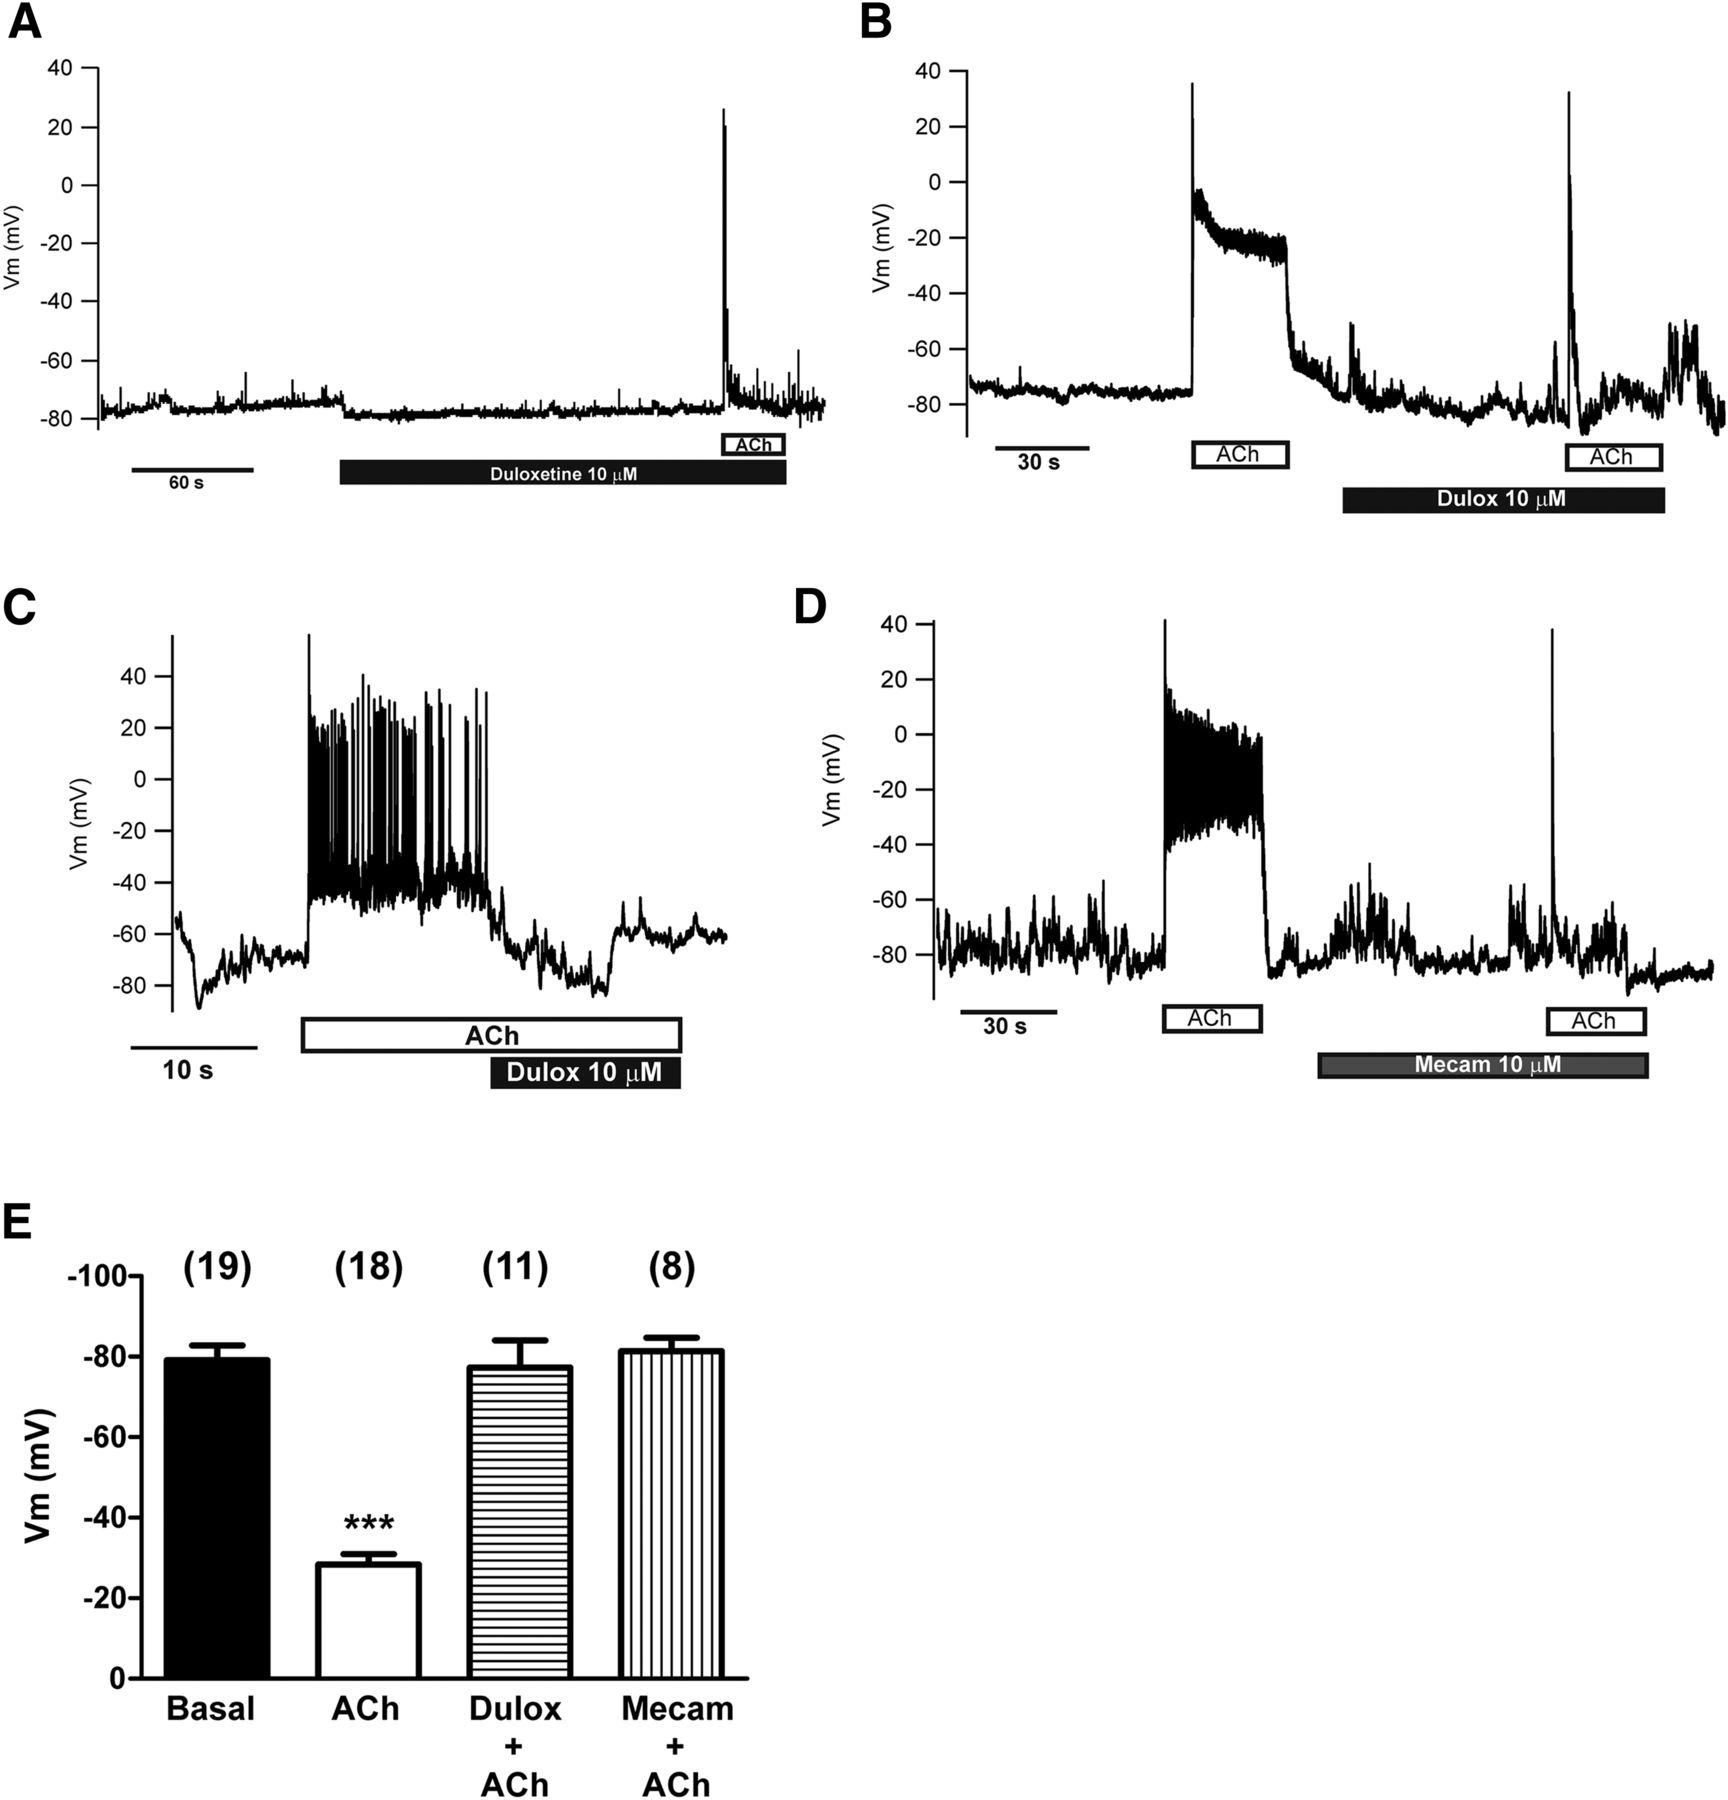 Dual Antidepressant Duloxetine Blocks Nicotinic Receptor Currents